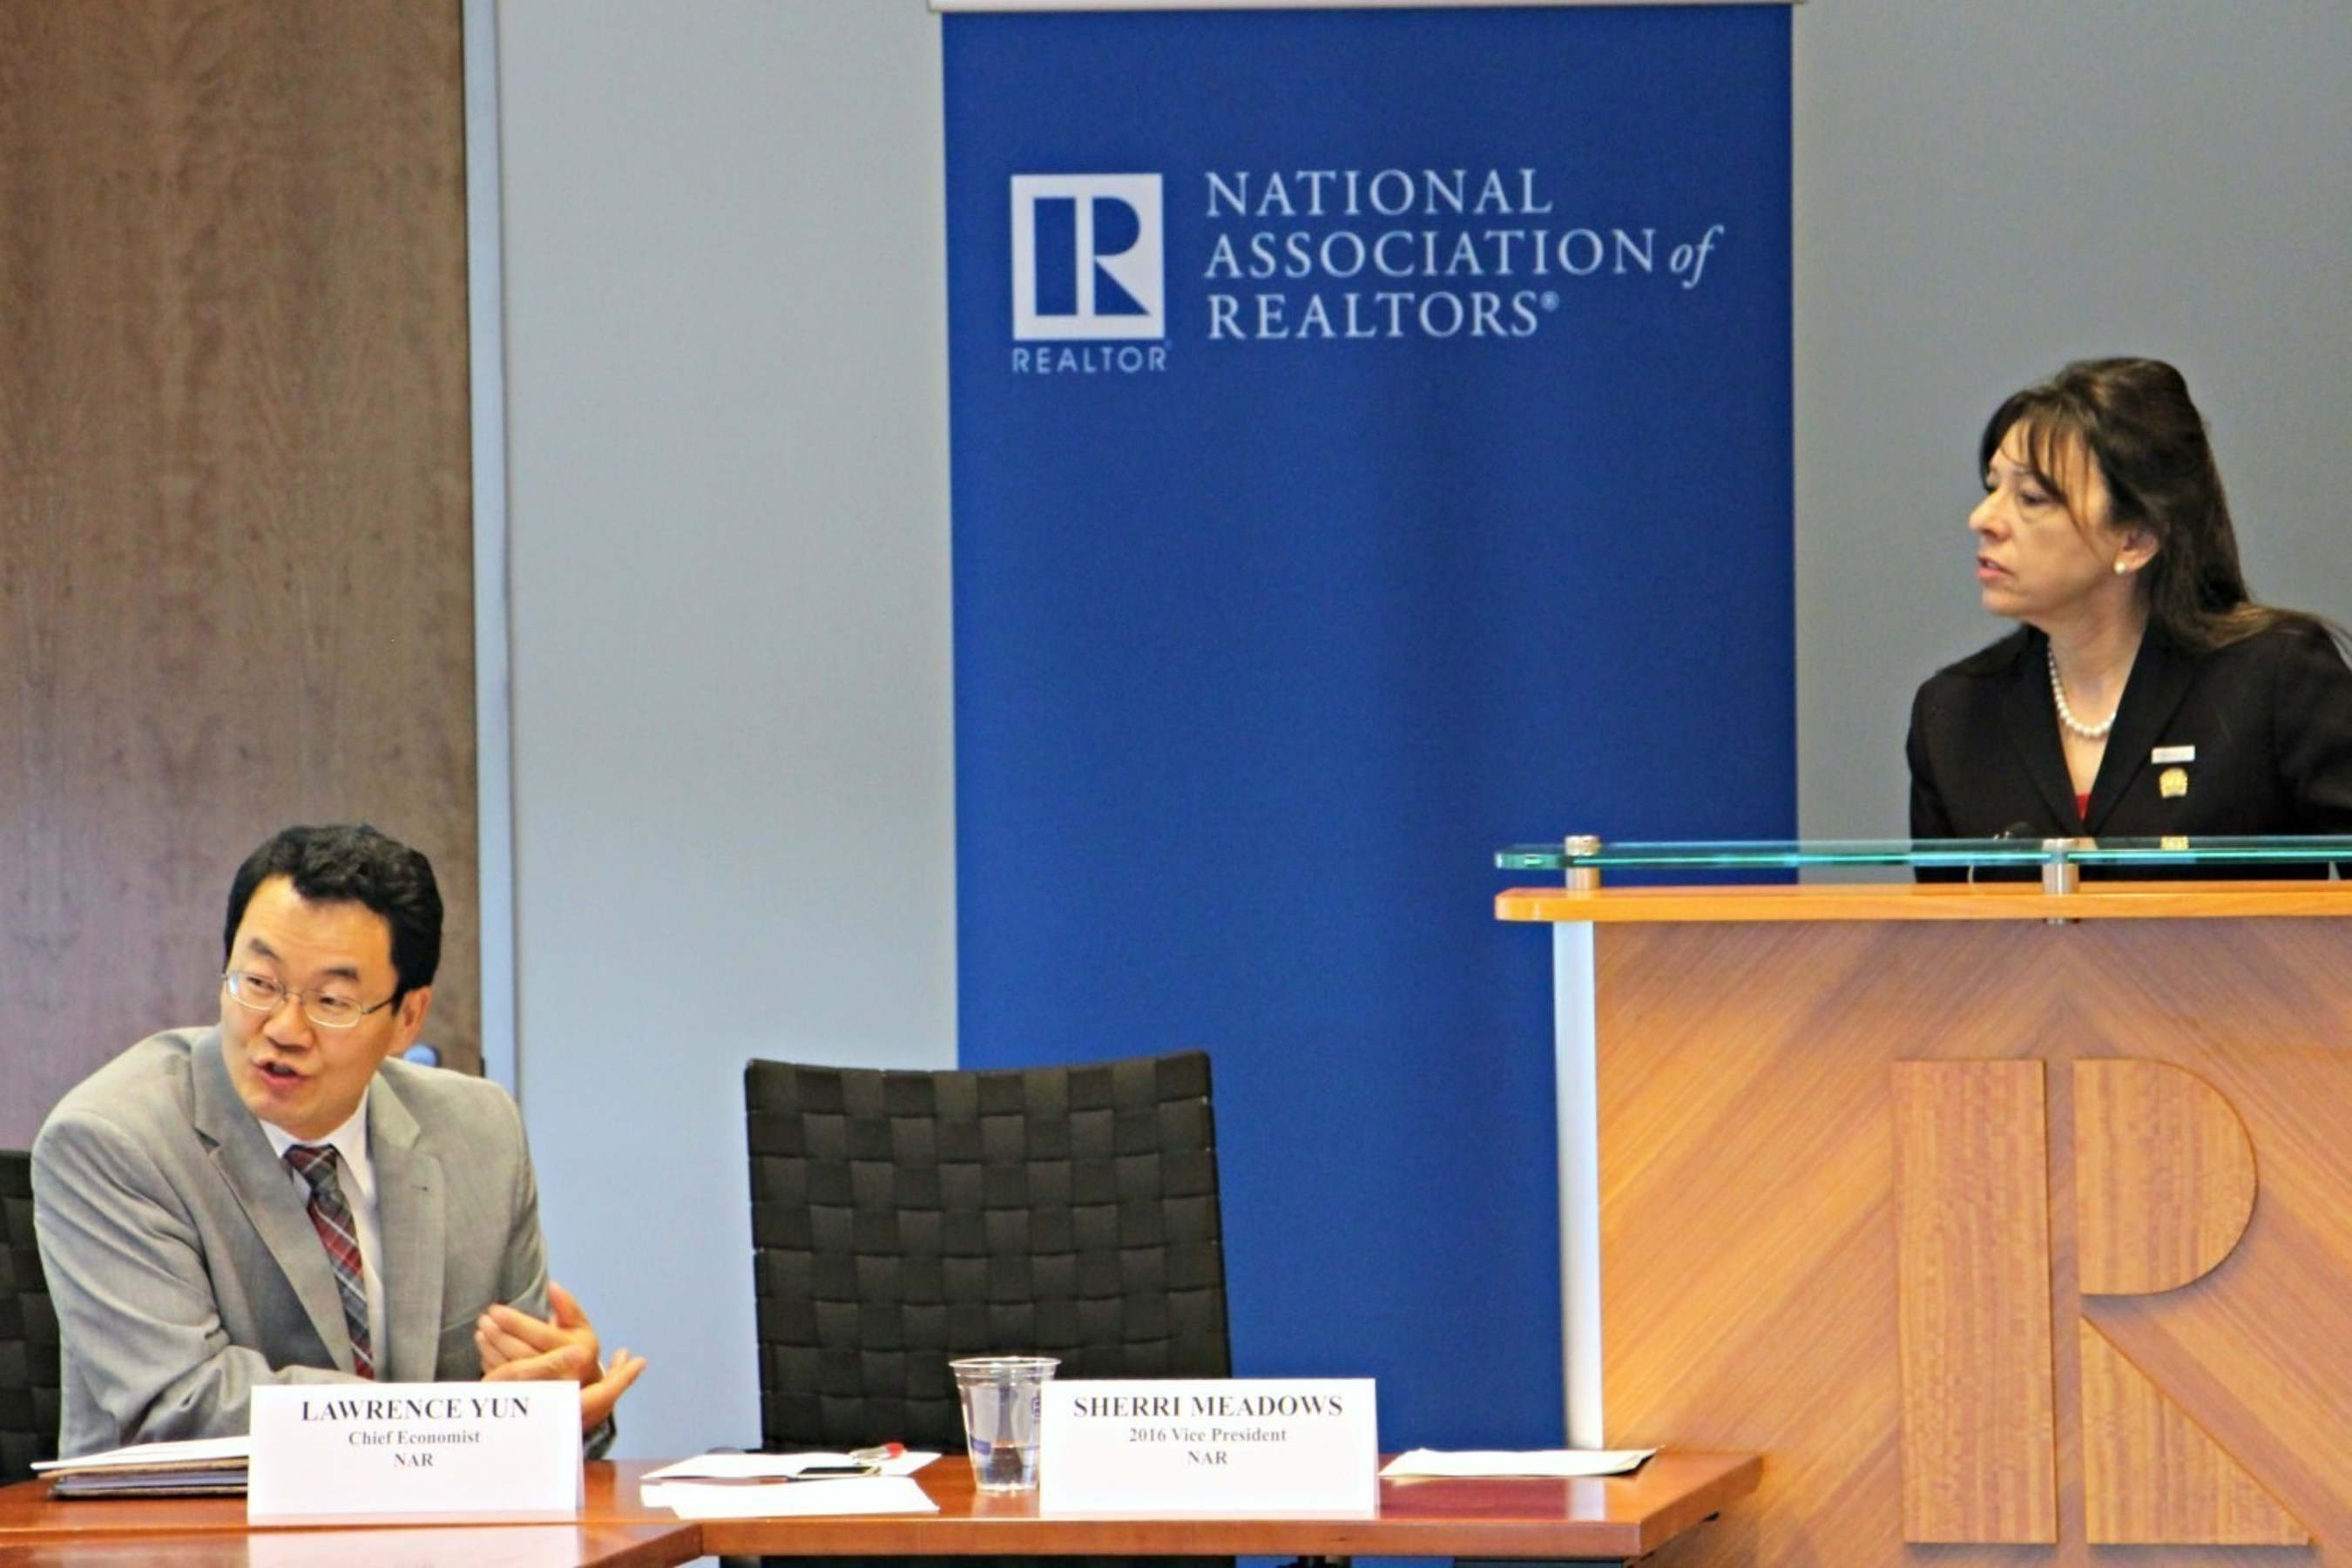 National Association of Realtors, Chief Economist Lawrence Yun & Vice President Sherri Meadows